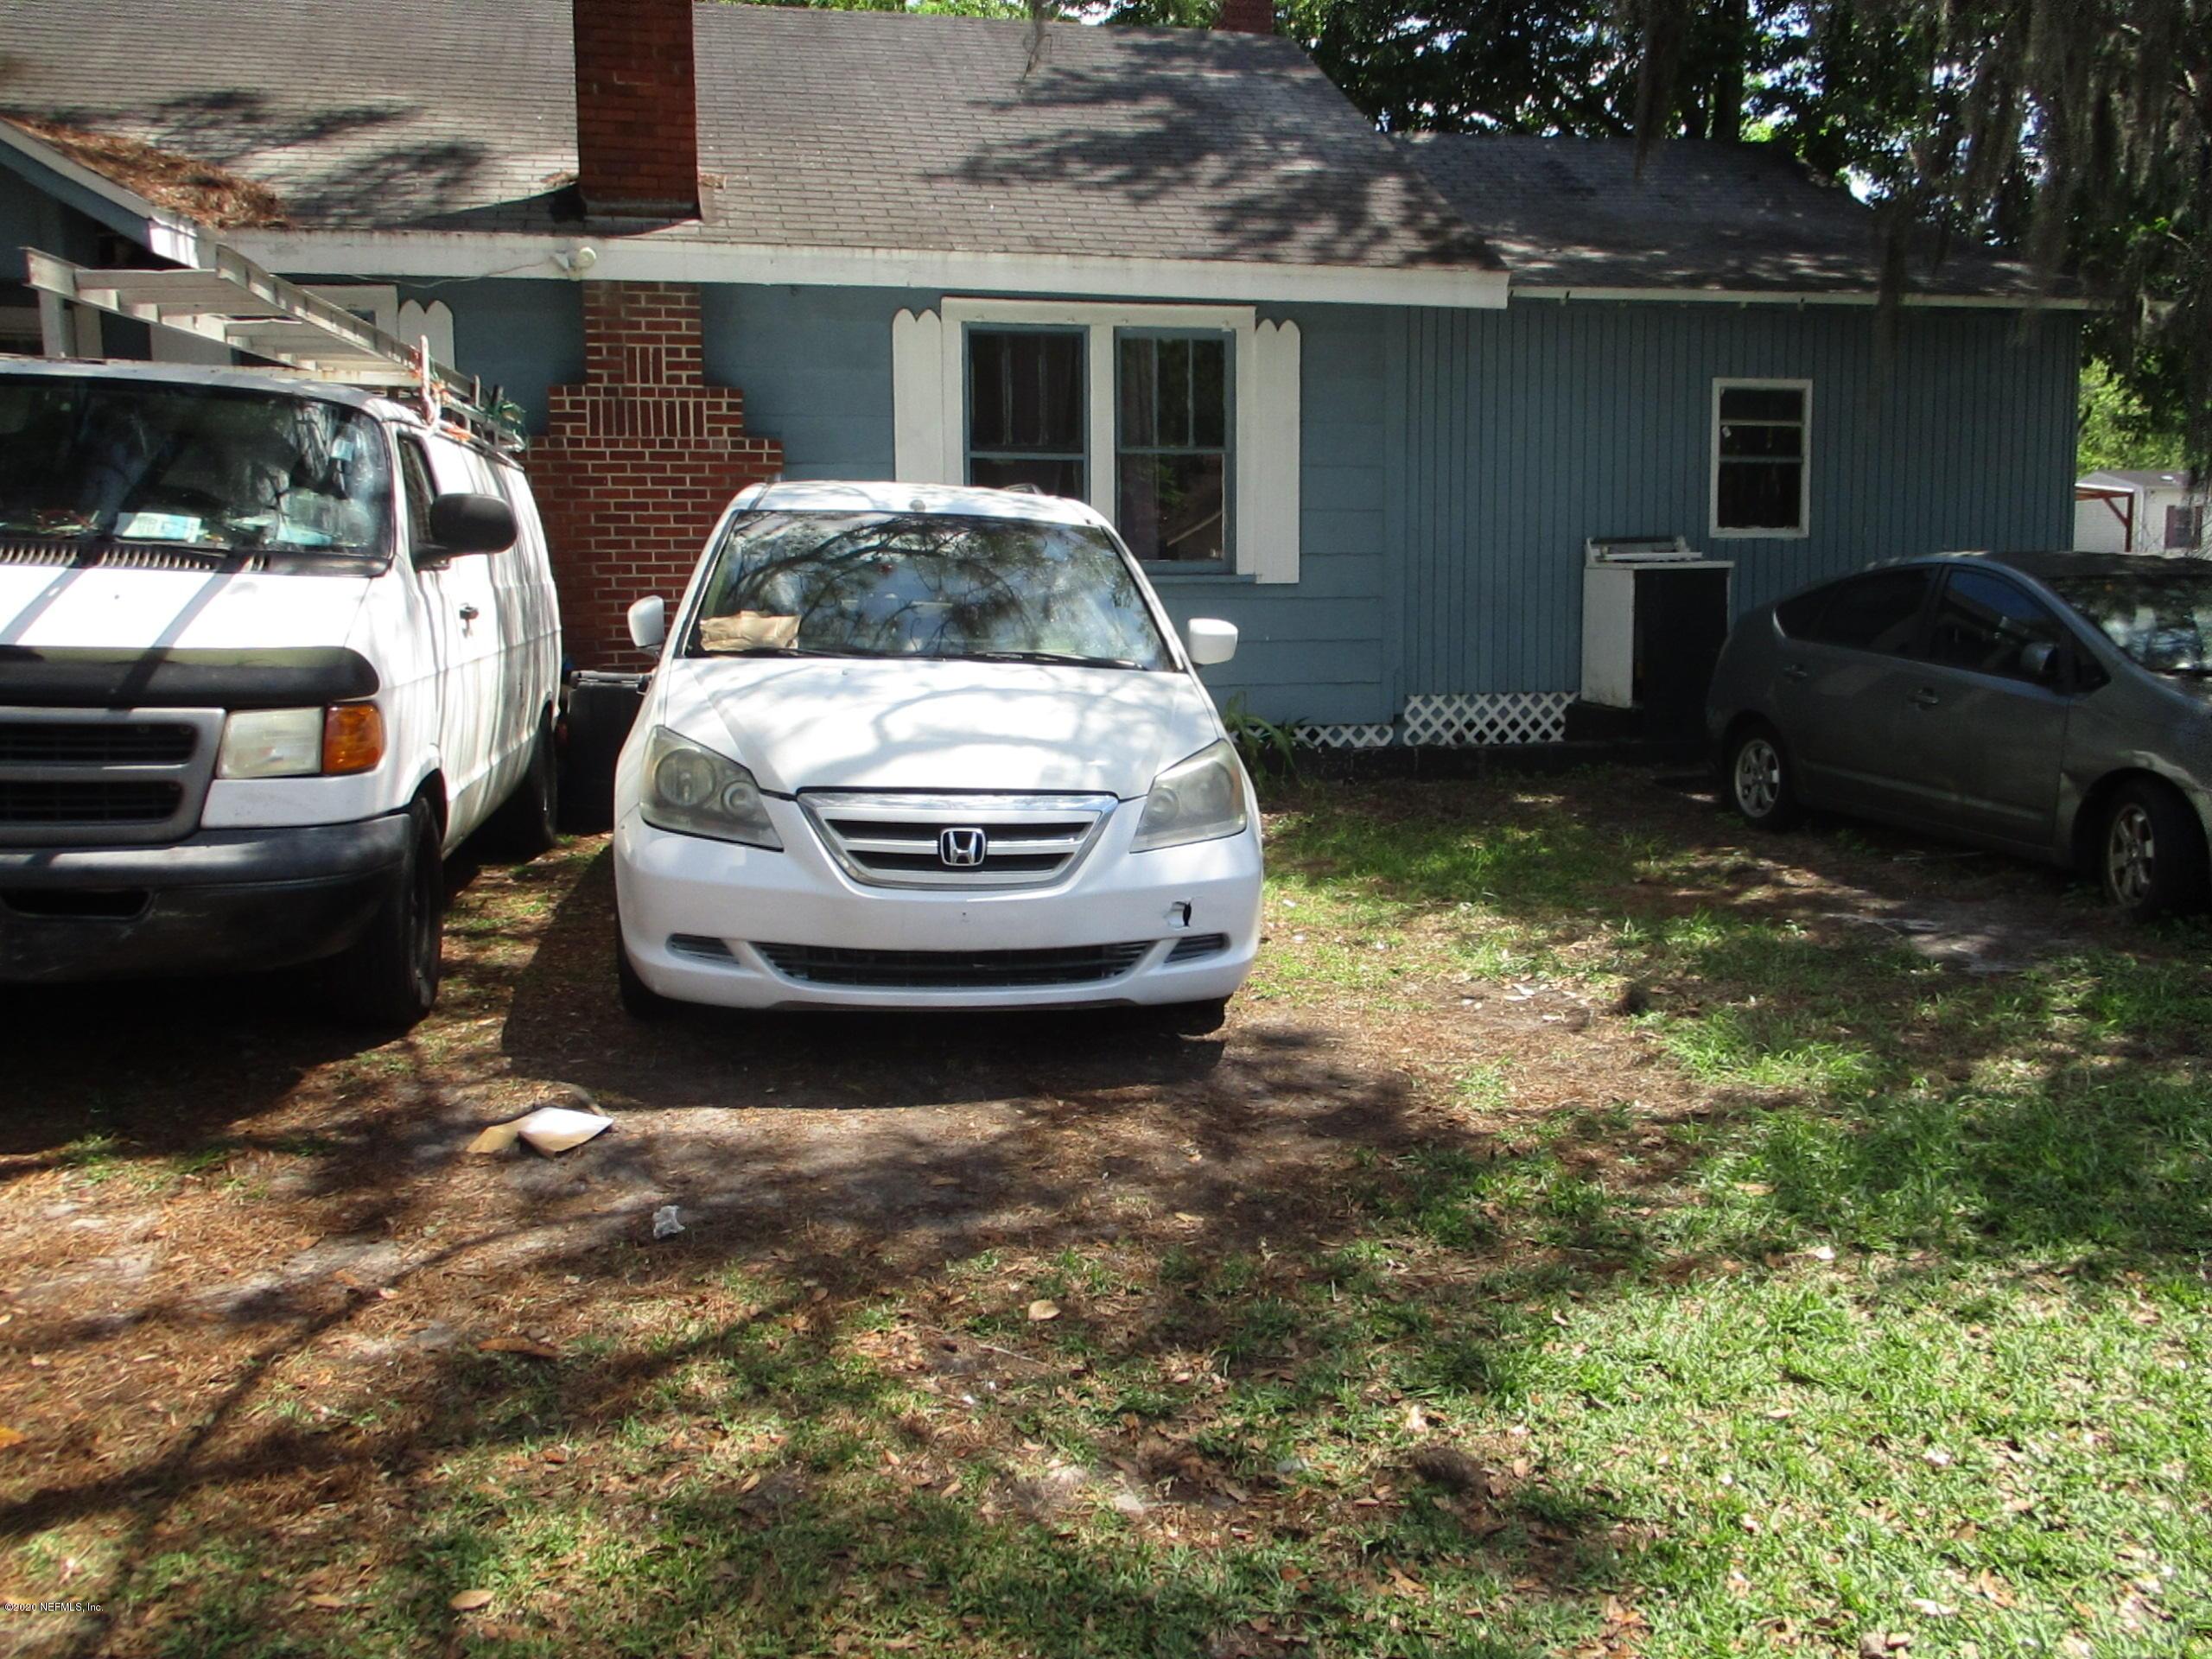 265 LANE, JACKSONVILLE, FLORIDA 32254, ,Commercial,For sale,LANE,1084138